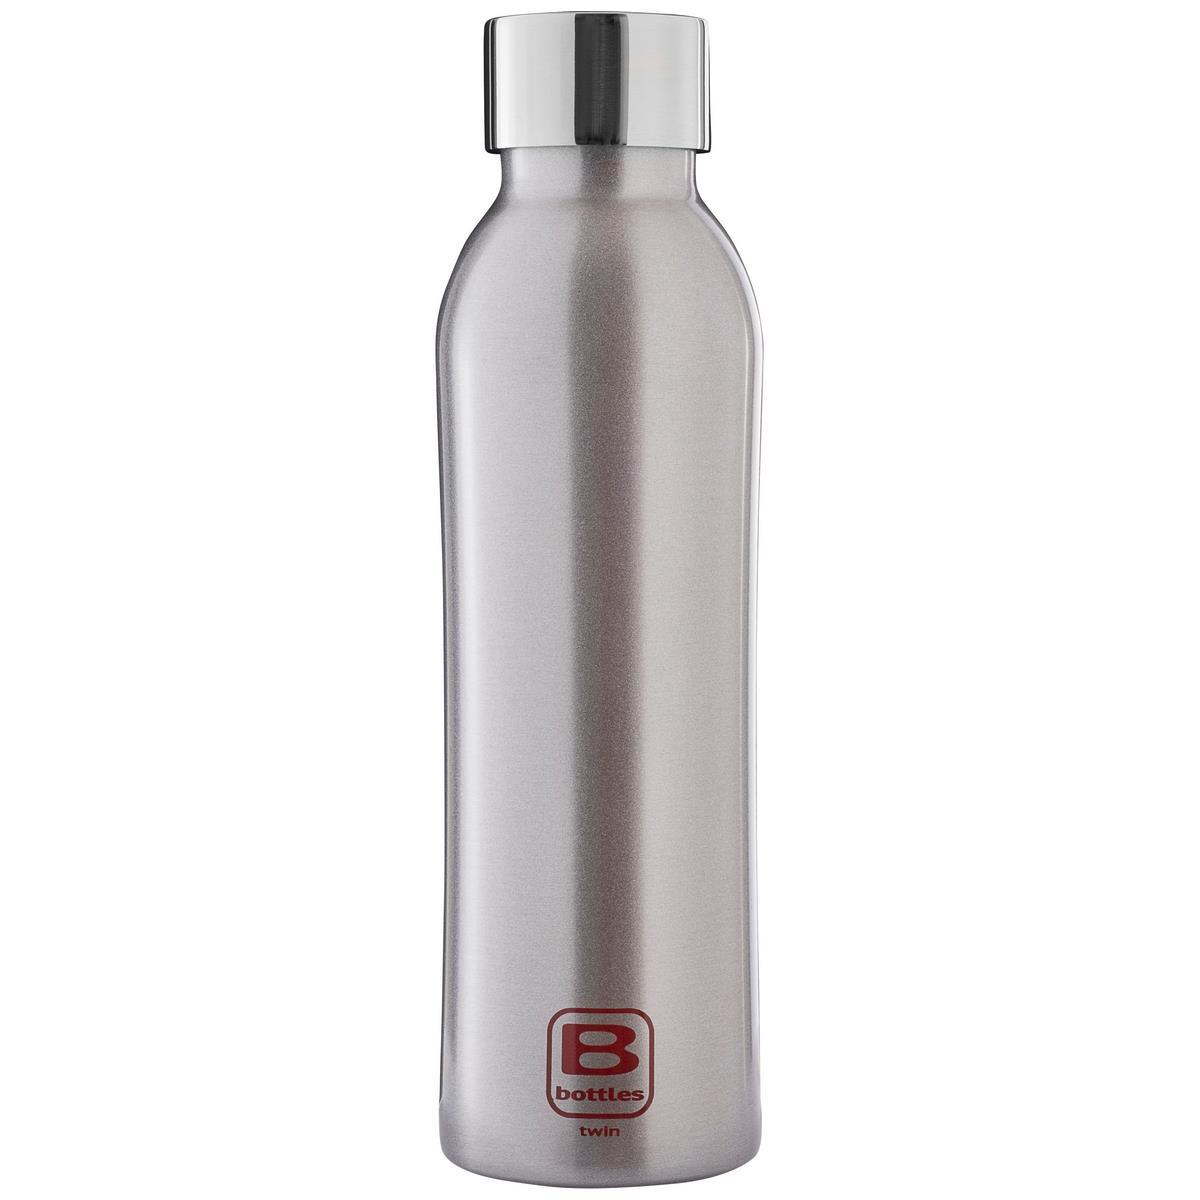 B Bottles Twin - Silver Brushed - 500 ml - Bottiglia Termica a doppia parete in acciaio inox 18/10